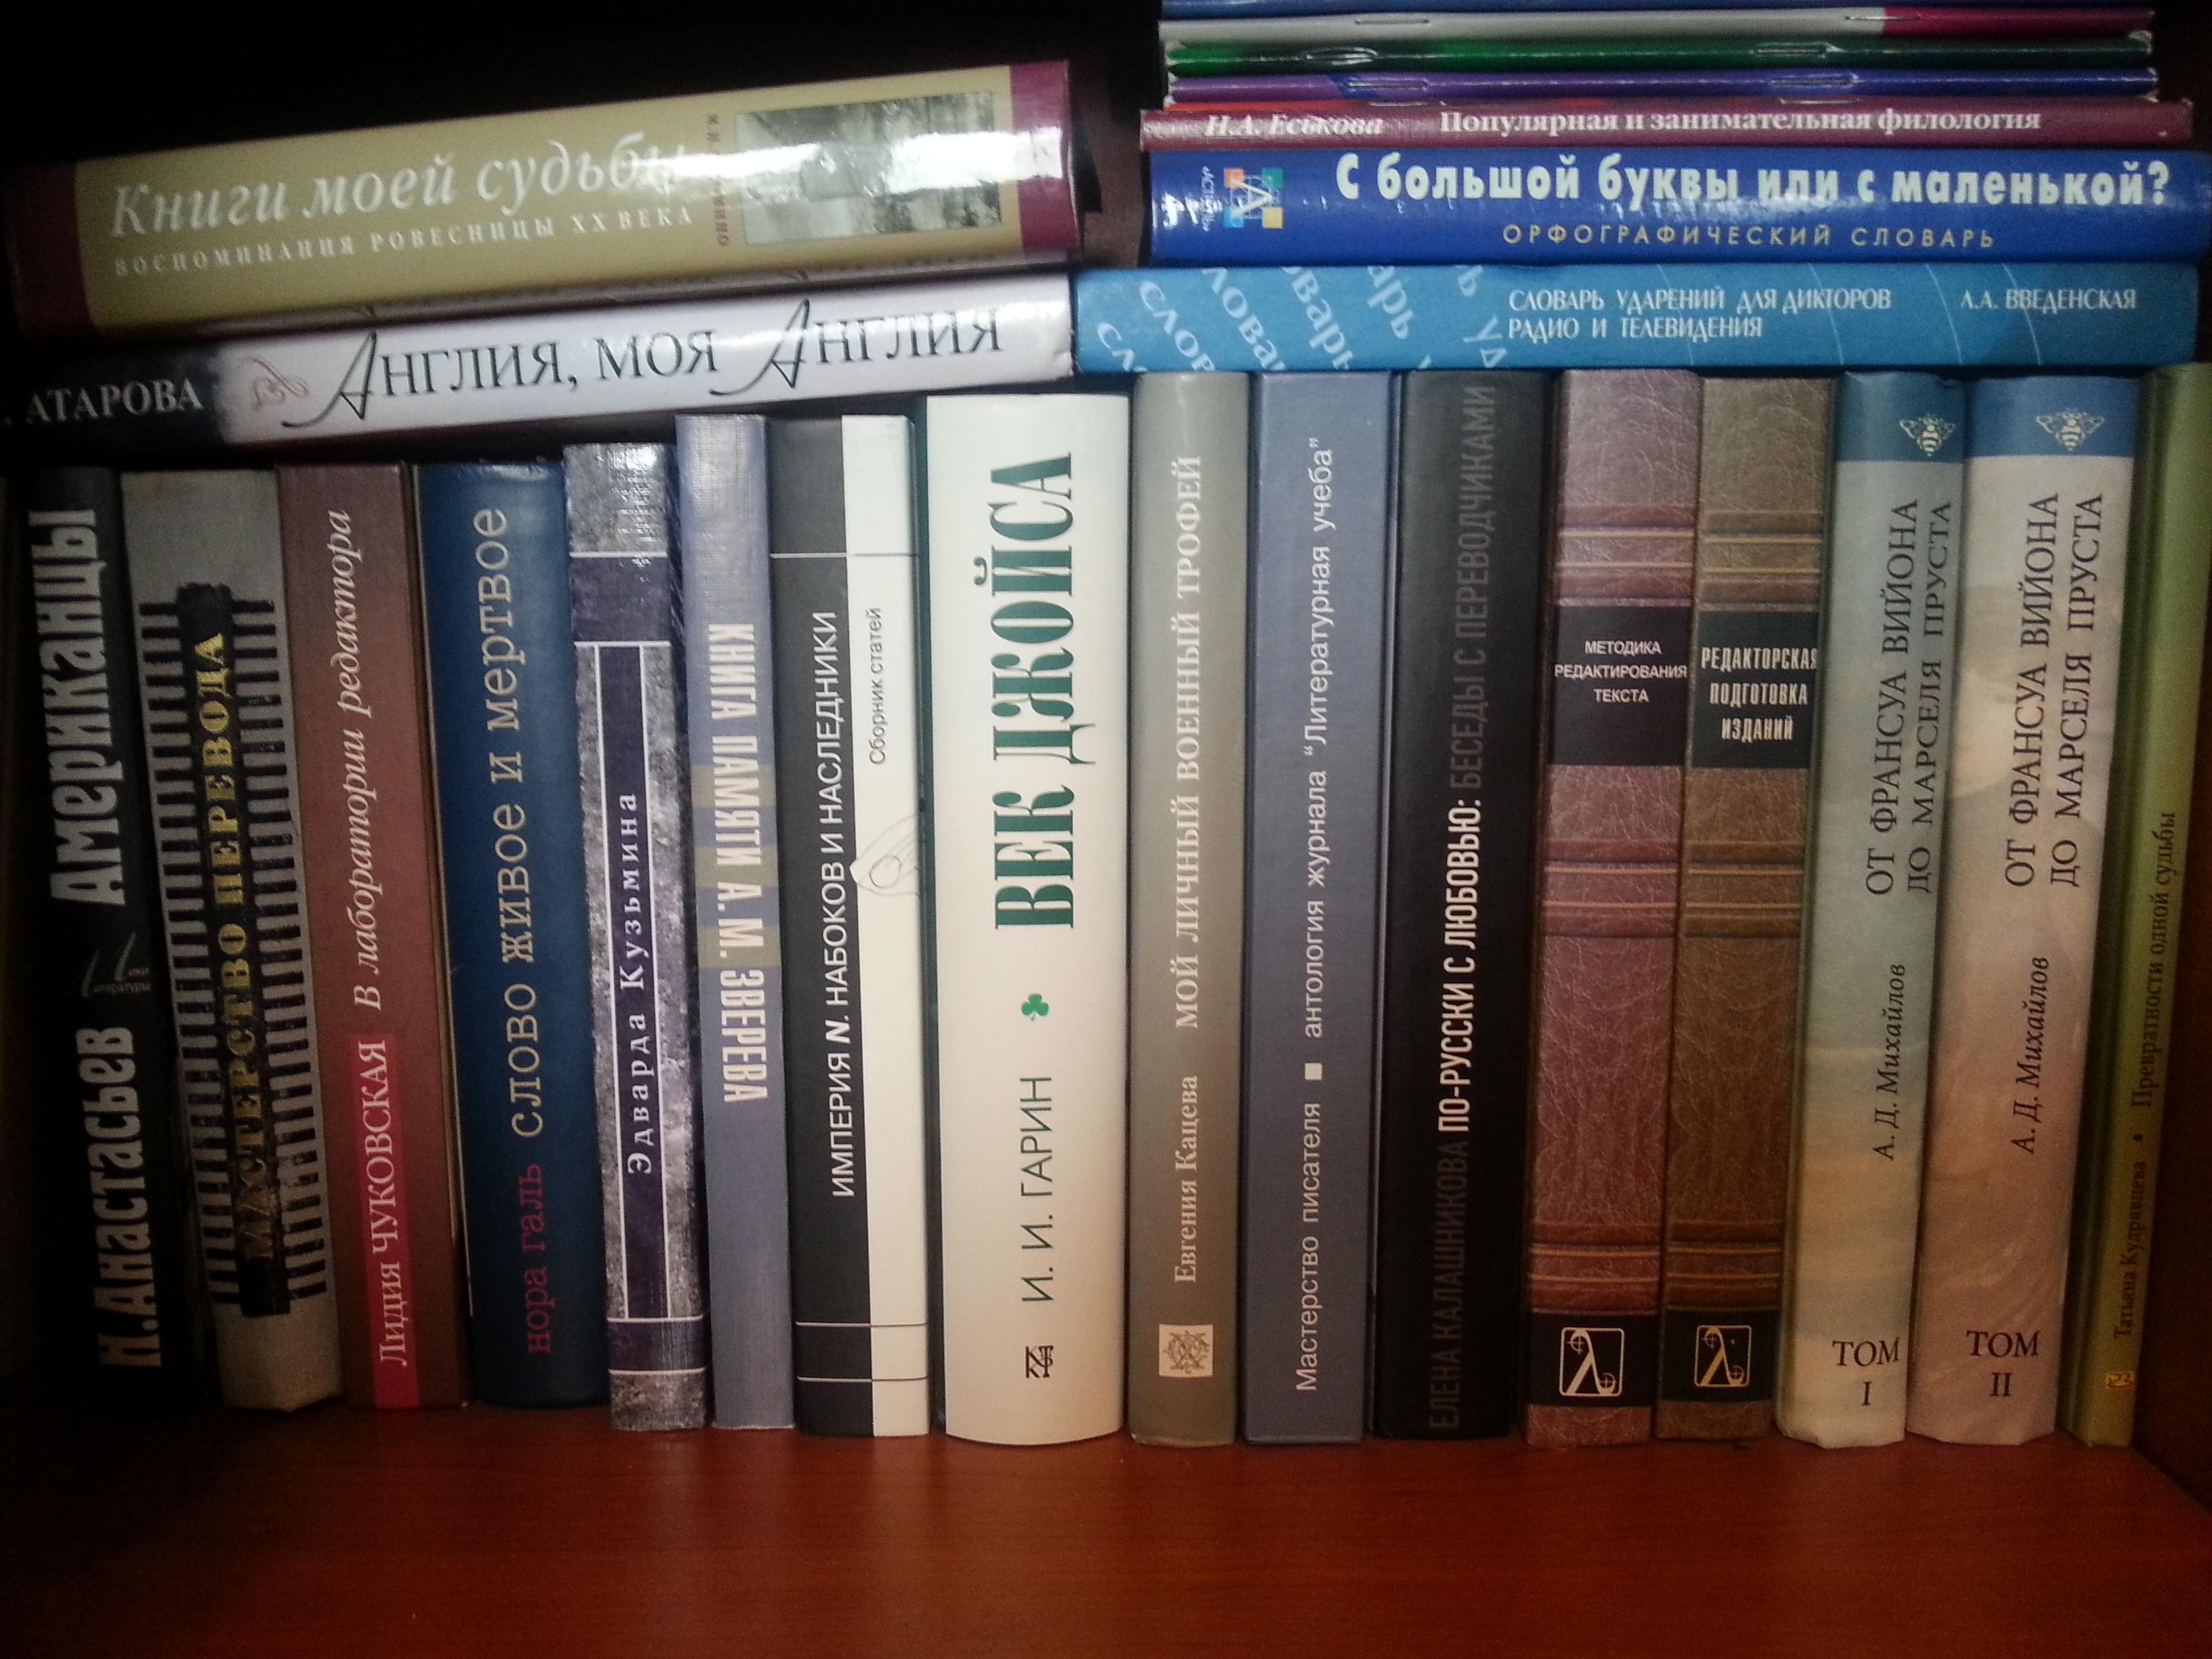 Redguard-books__23-10-17.jpg